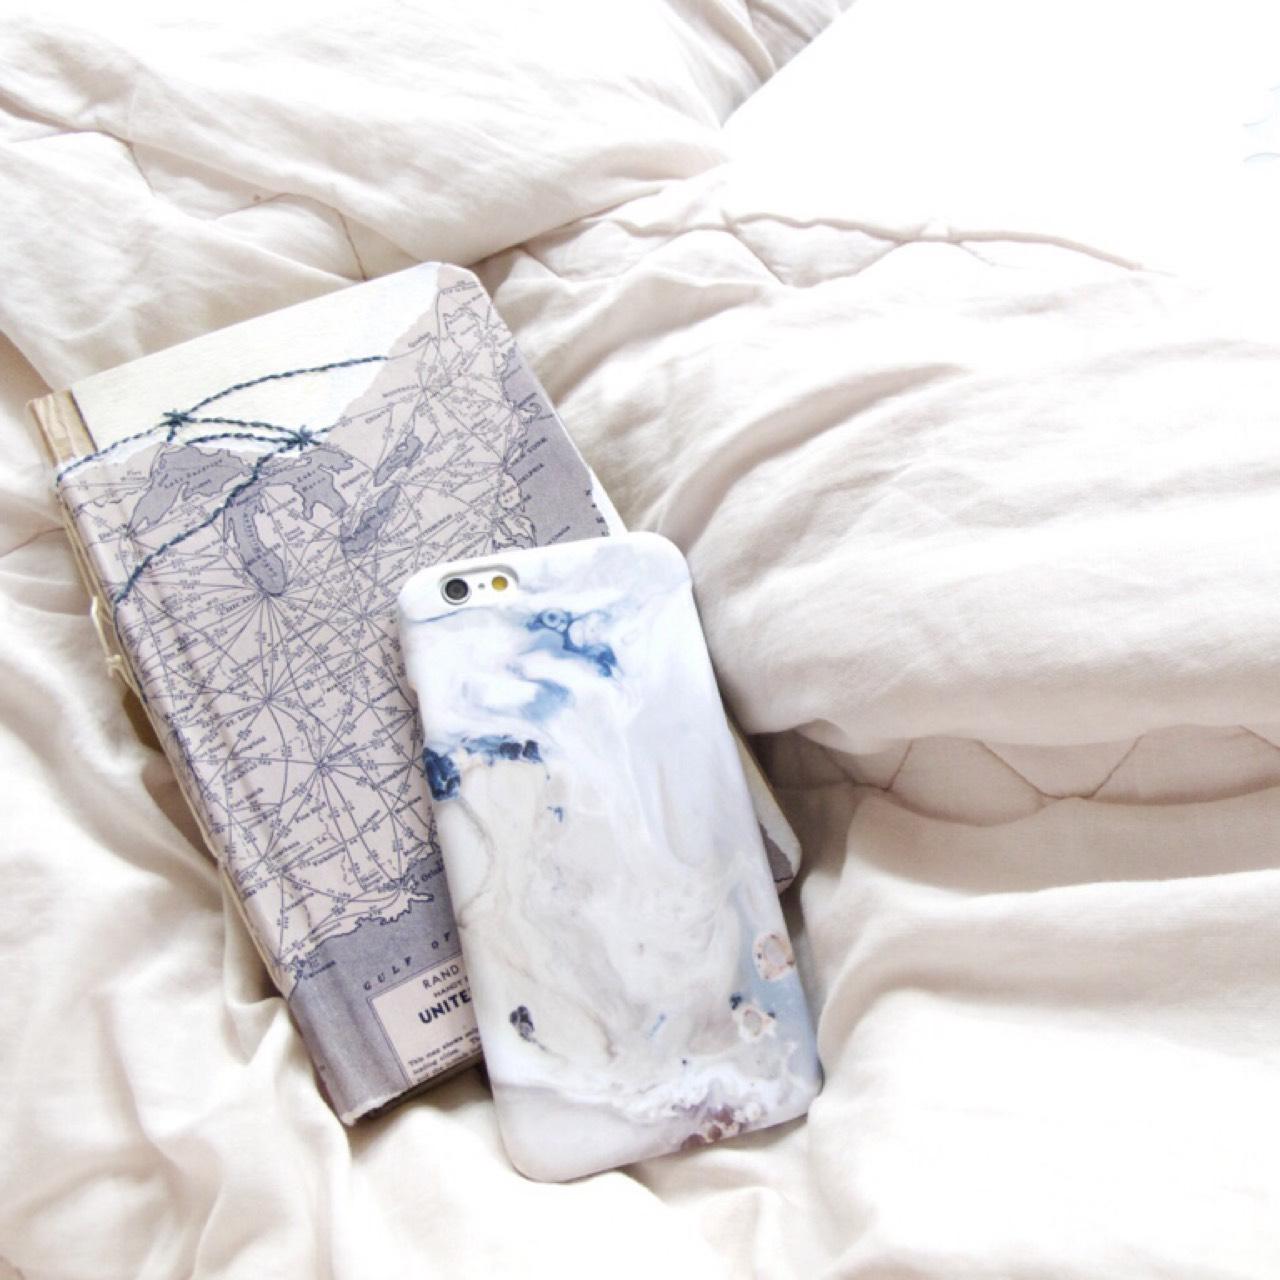 marble,marblecase,iphone,เคสหินอ่อน,เคสไอโฟน,Pearl,stone